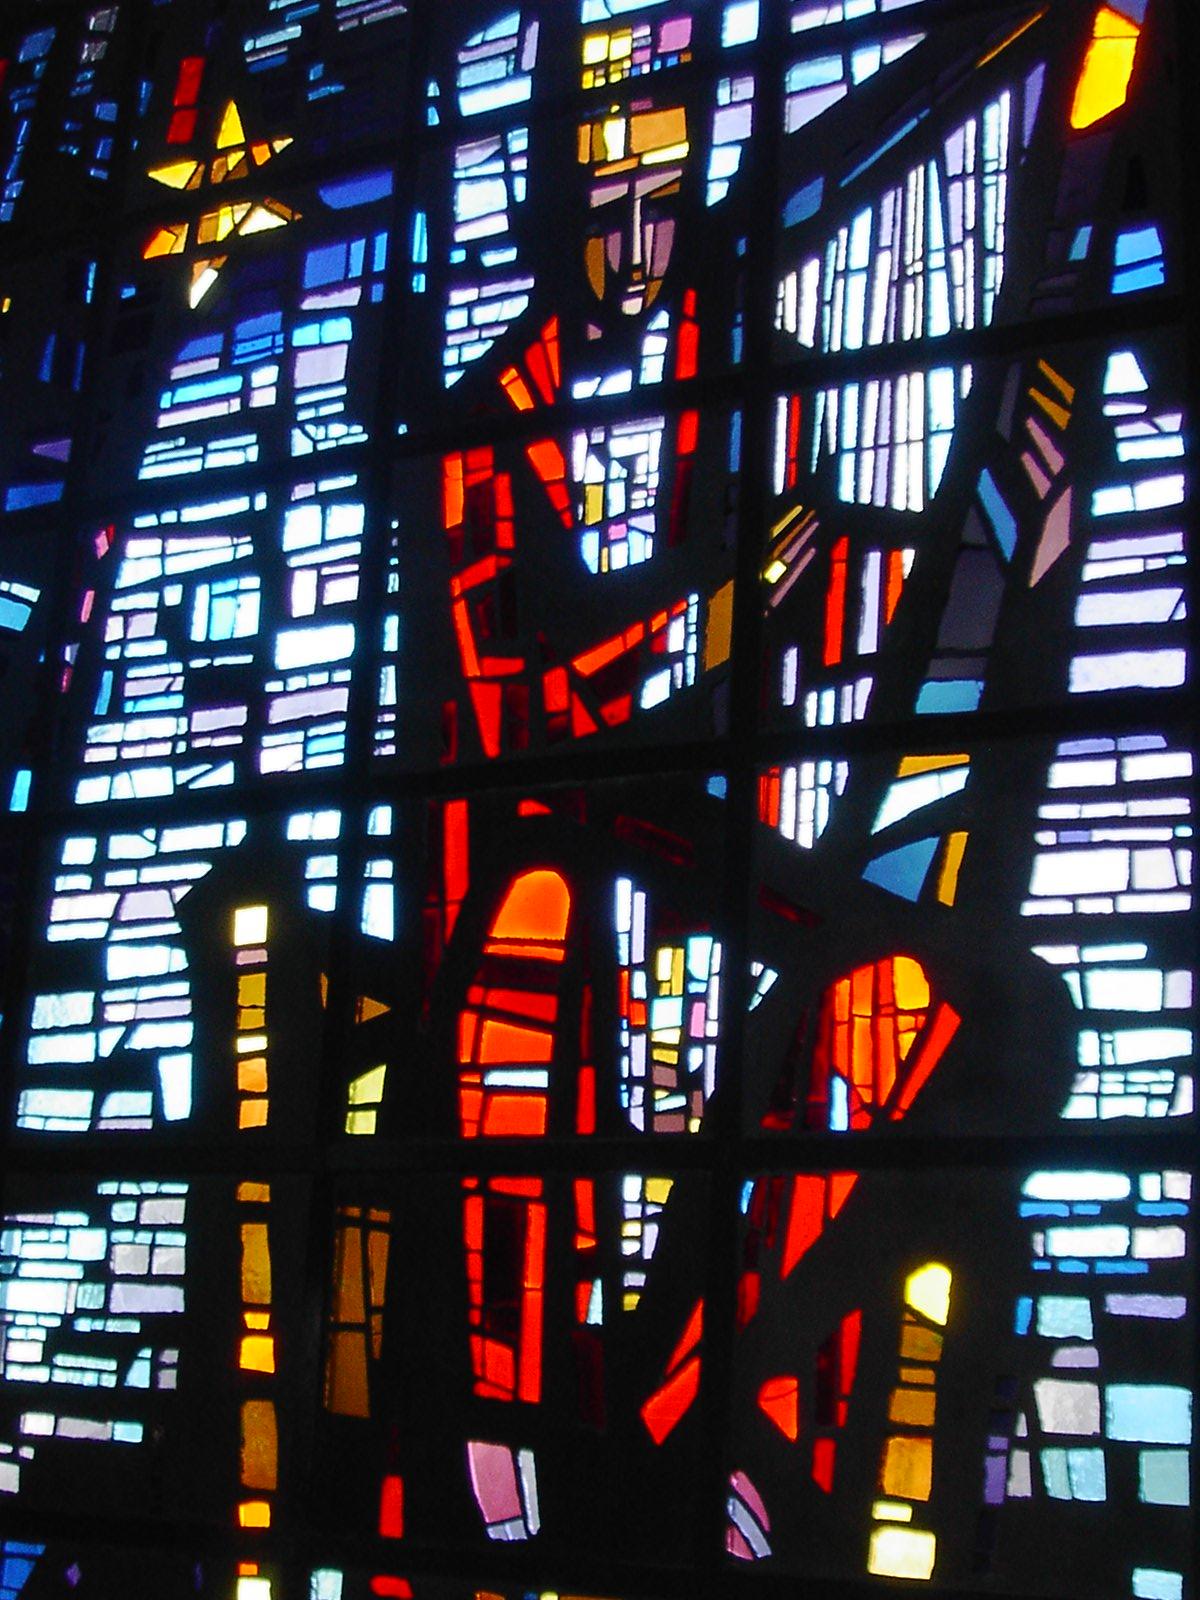 David-Fenster der Christkönigskirche Backnang